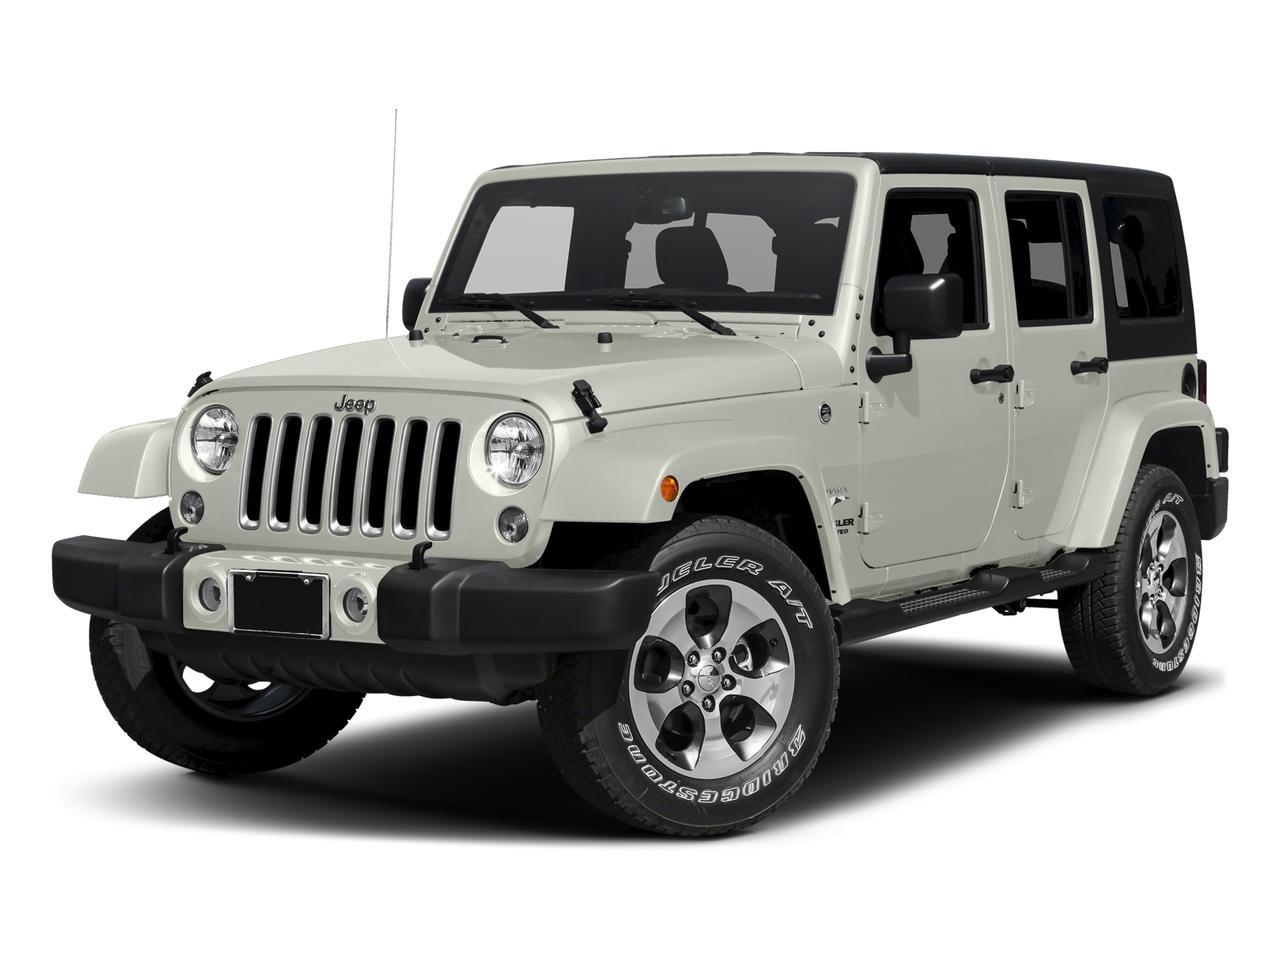 2016 Jeep Wrangler Unlimited Vehicle Photo in Winnsboro, SC 29180